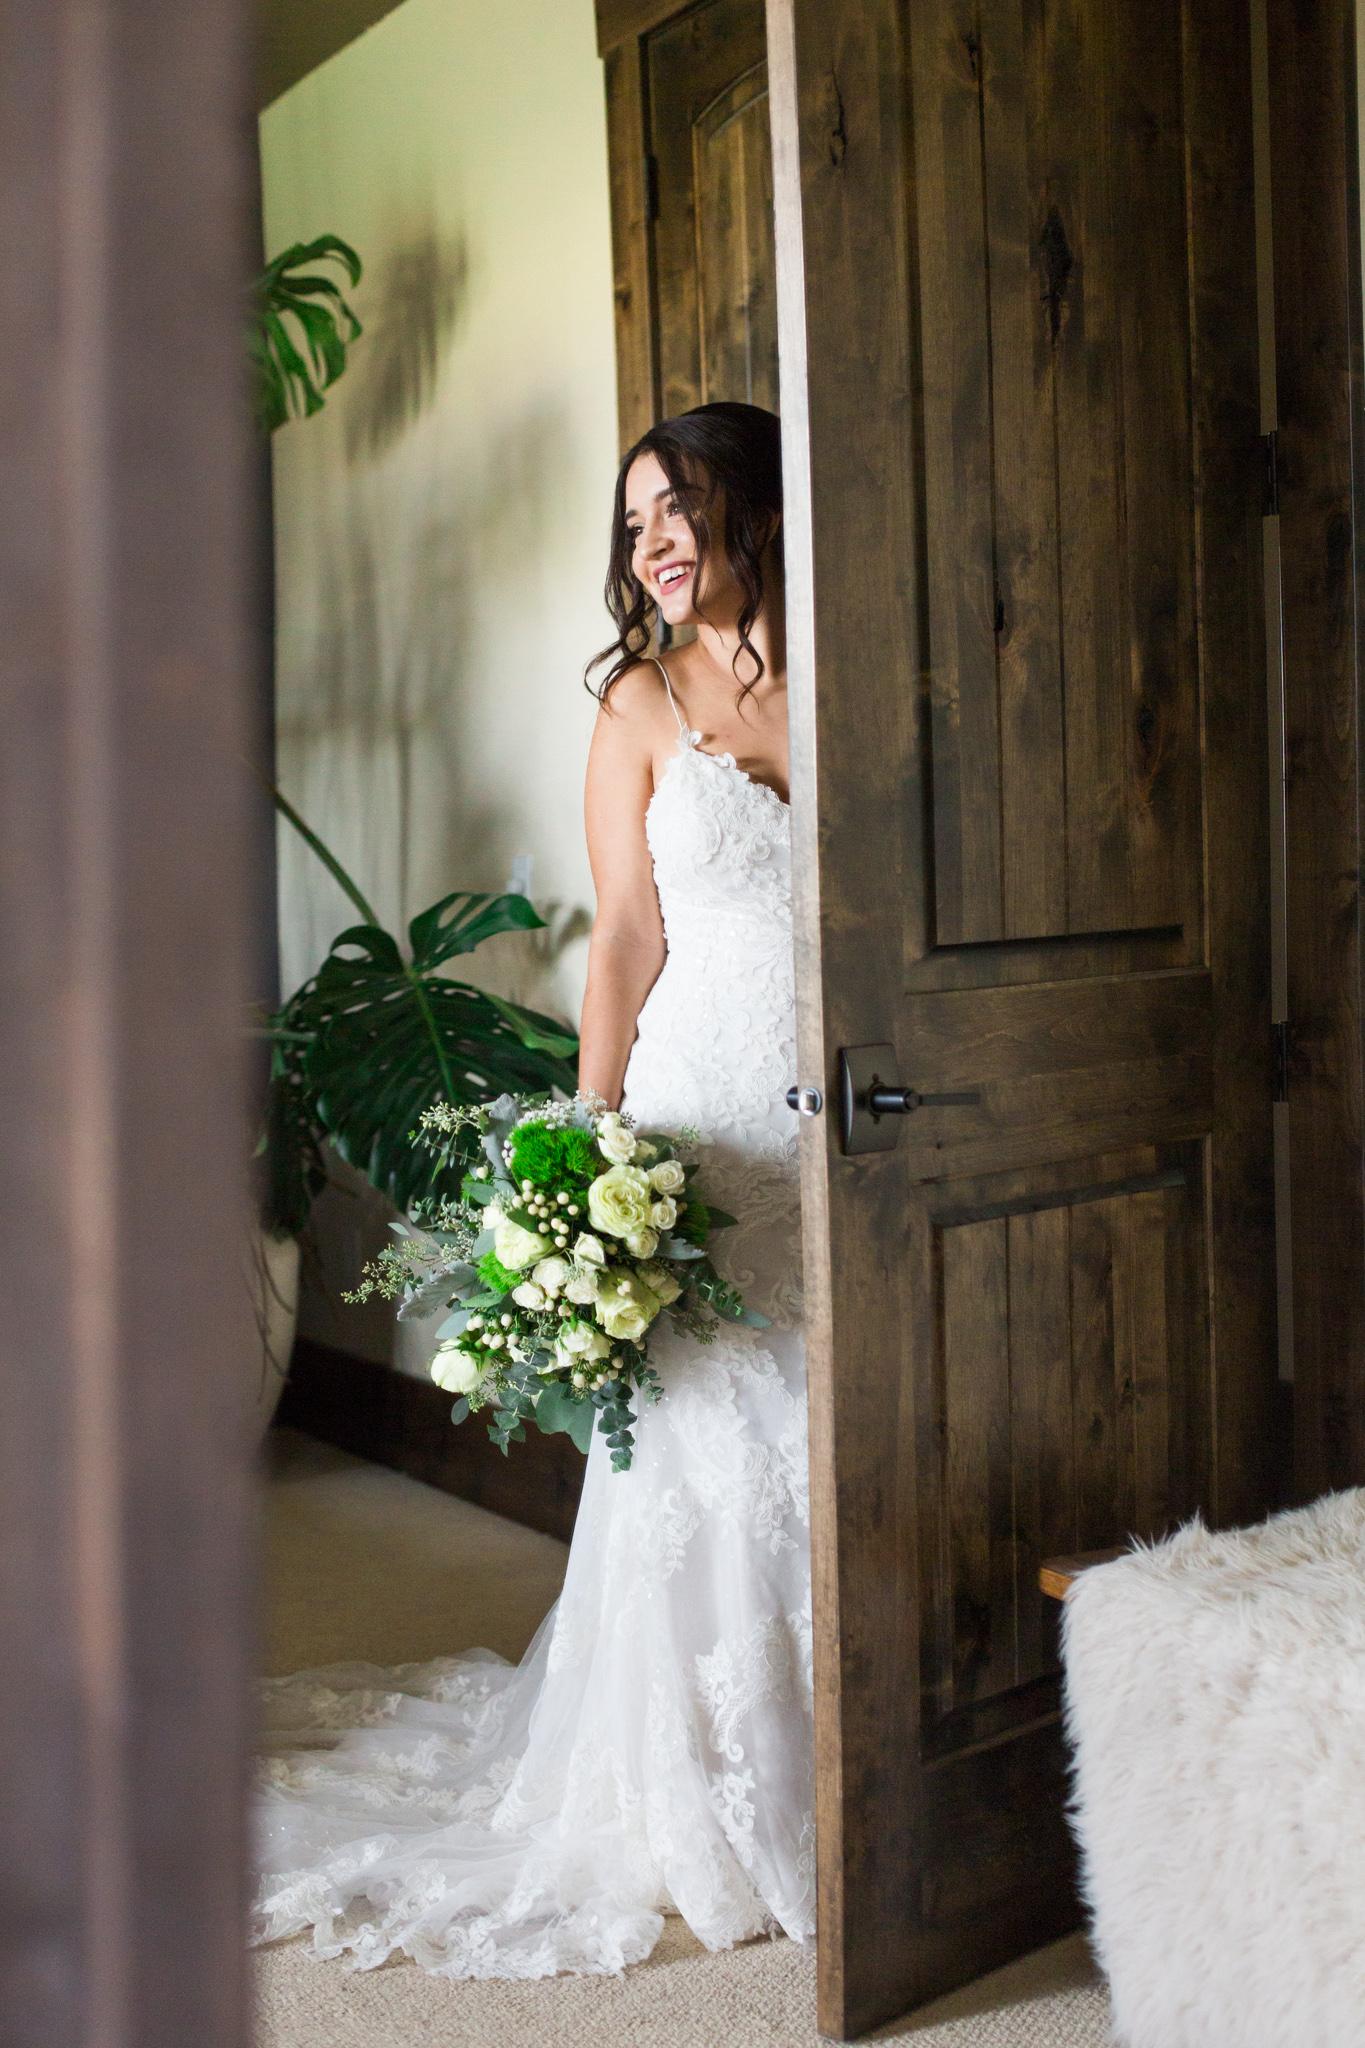 Olga_janni_wedding_090917_WEBSIZE (123 of 704).JPG